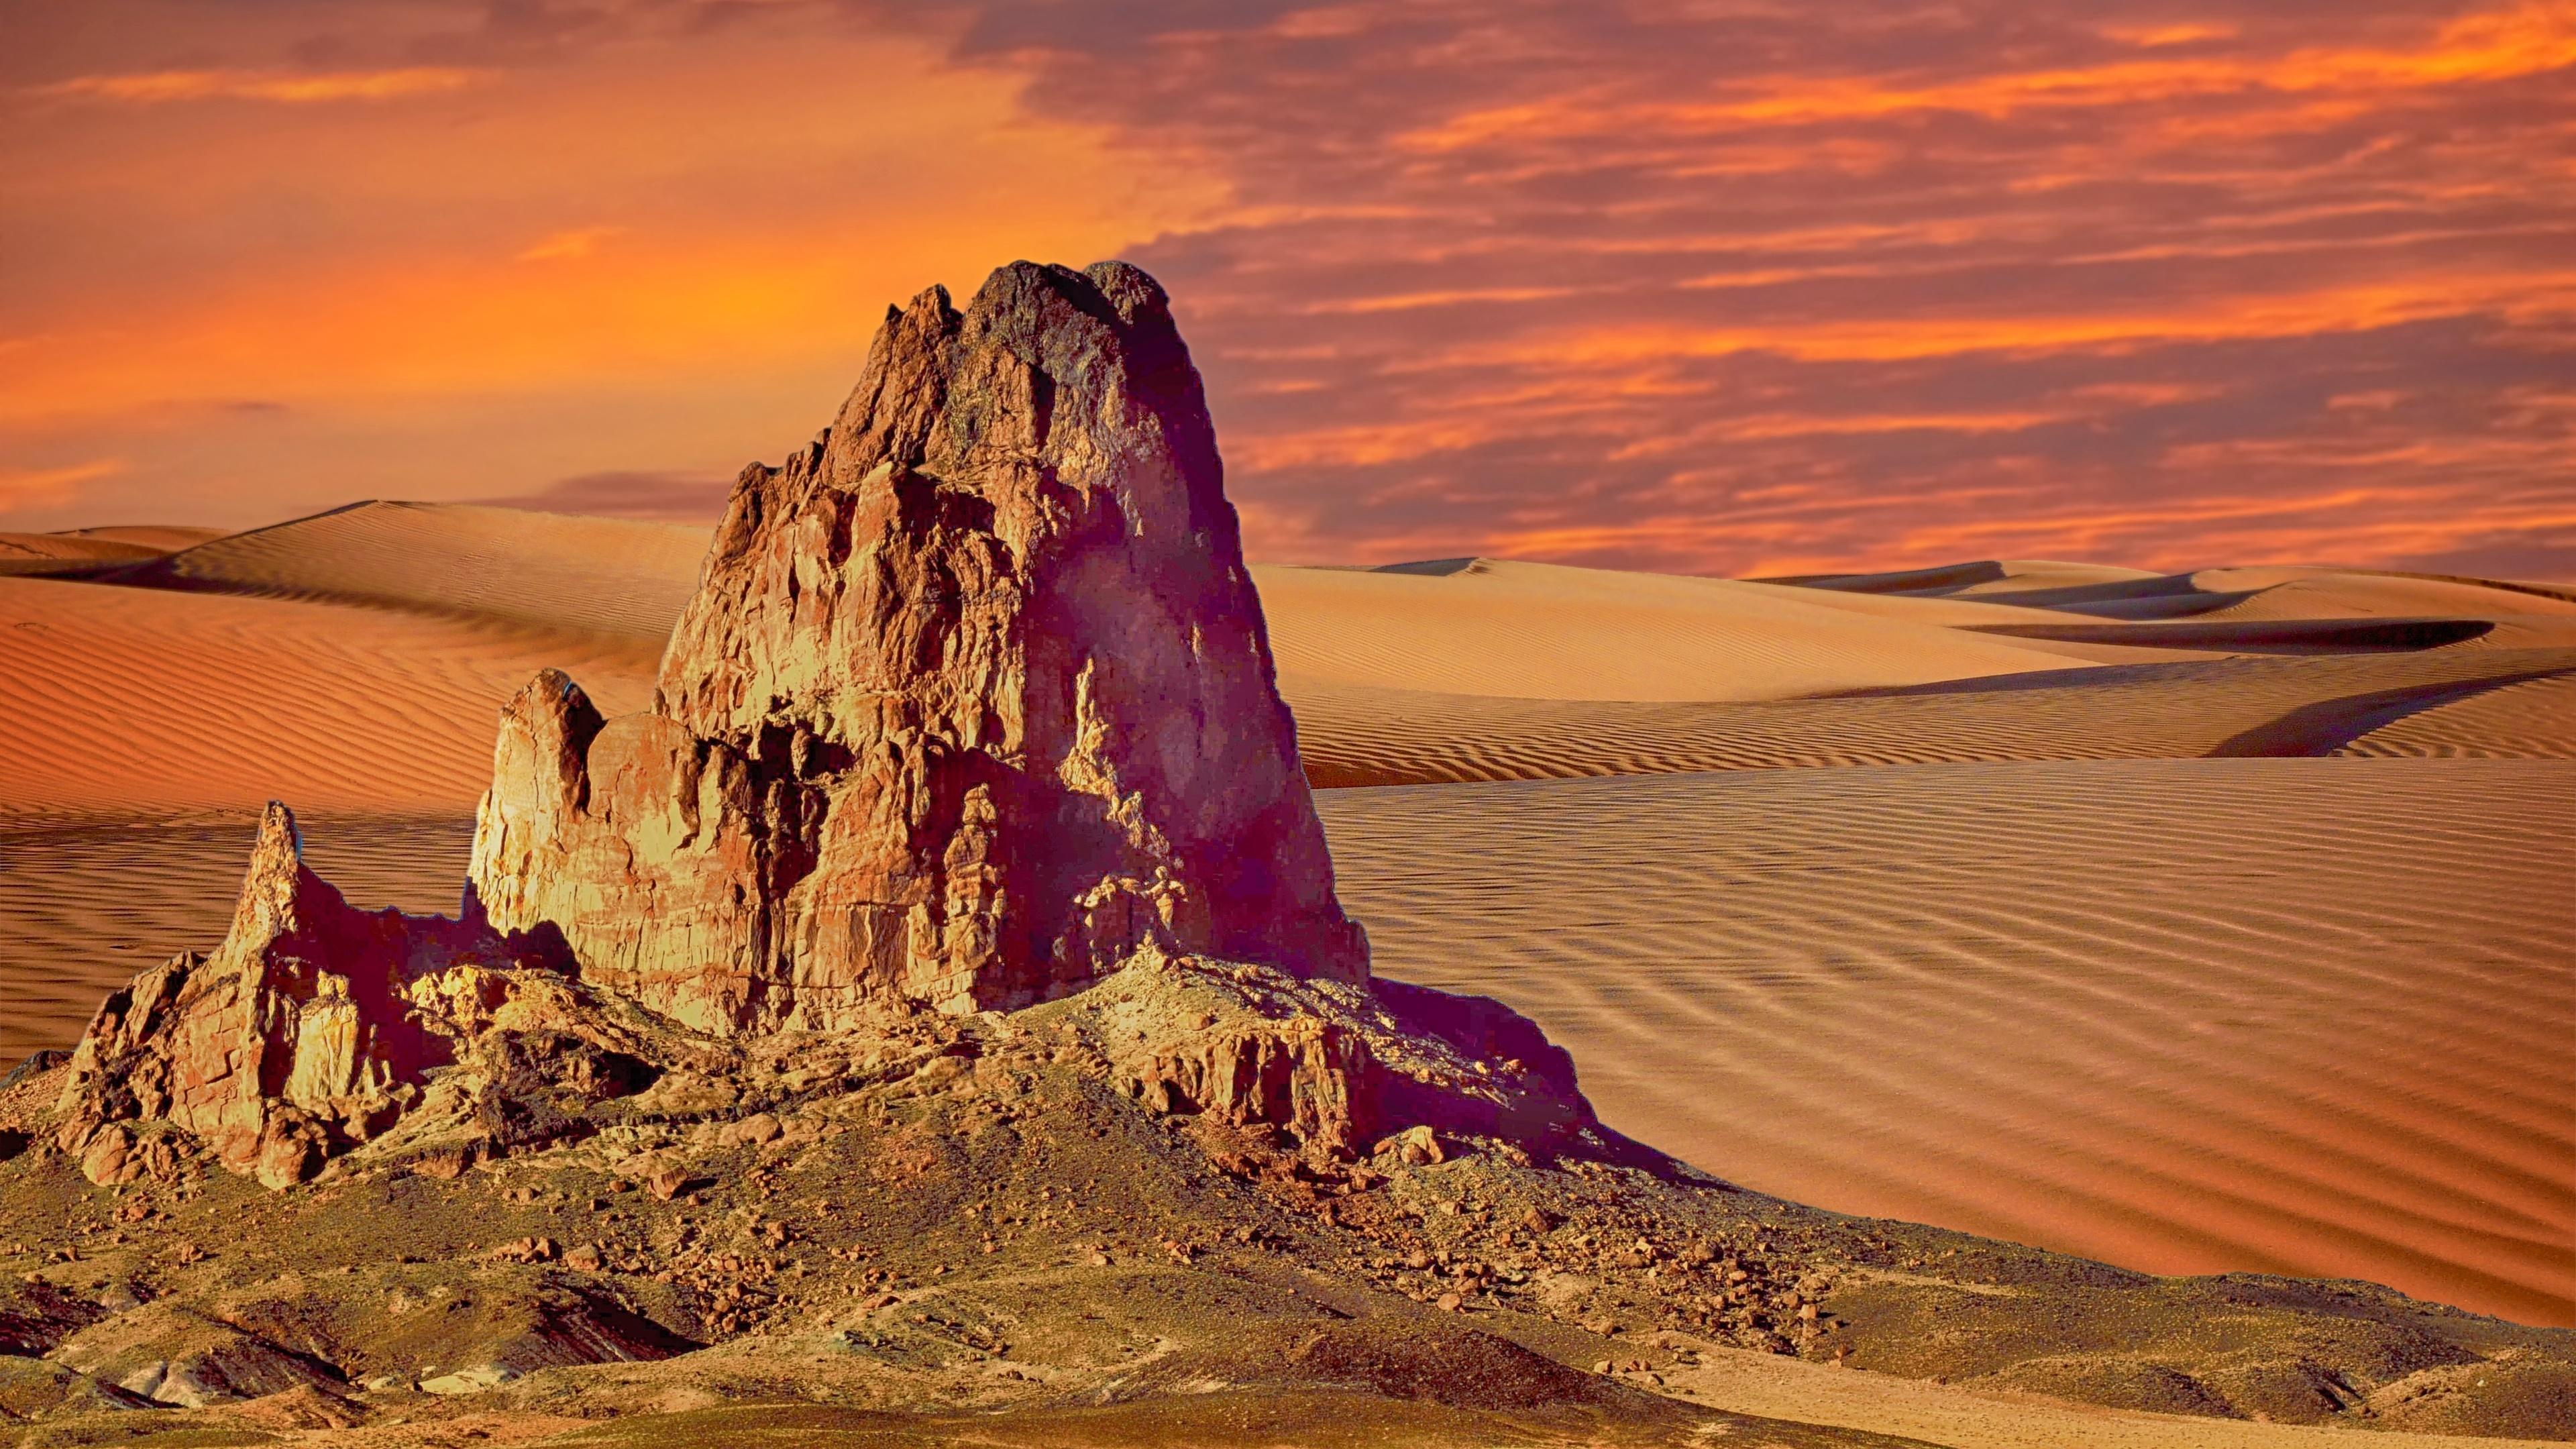 Rock in the desert wallpaper